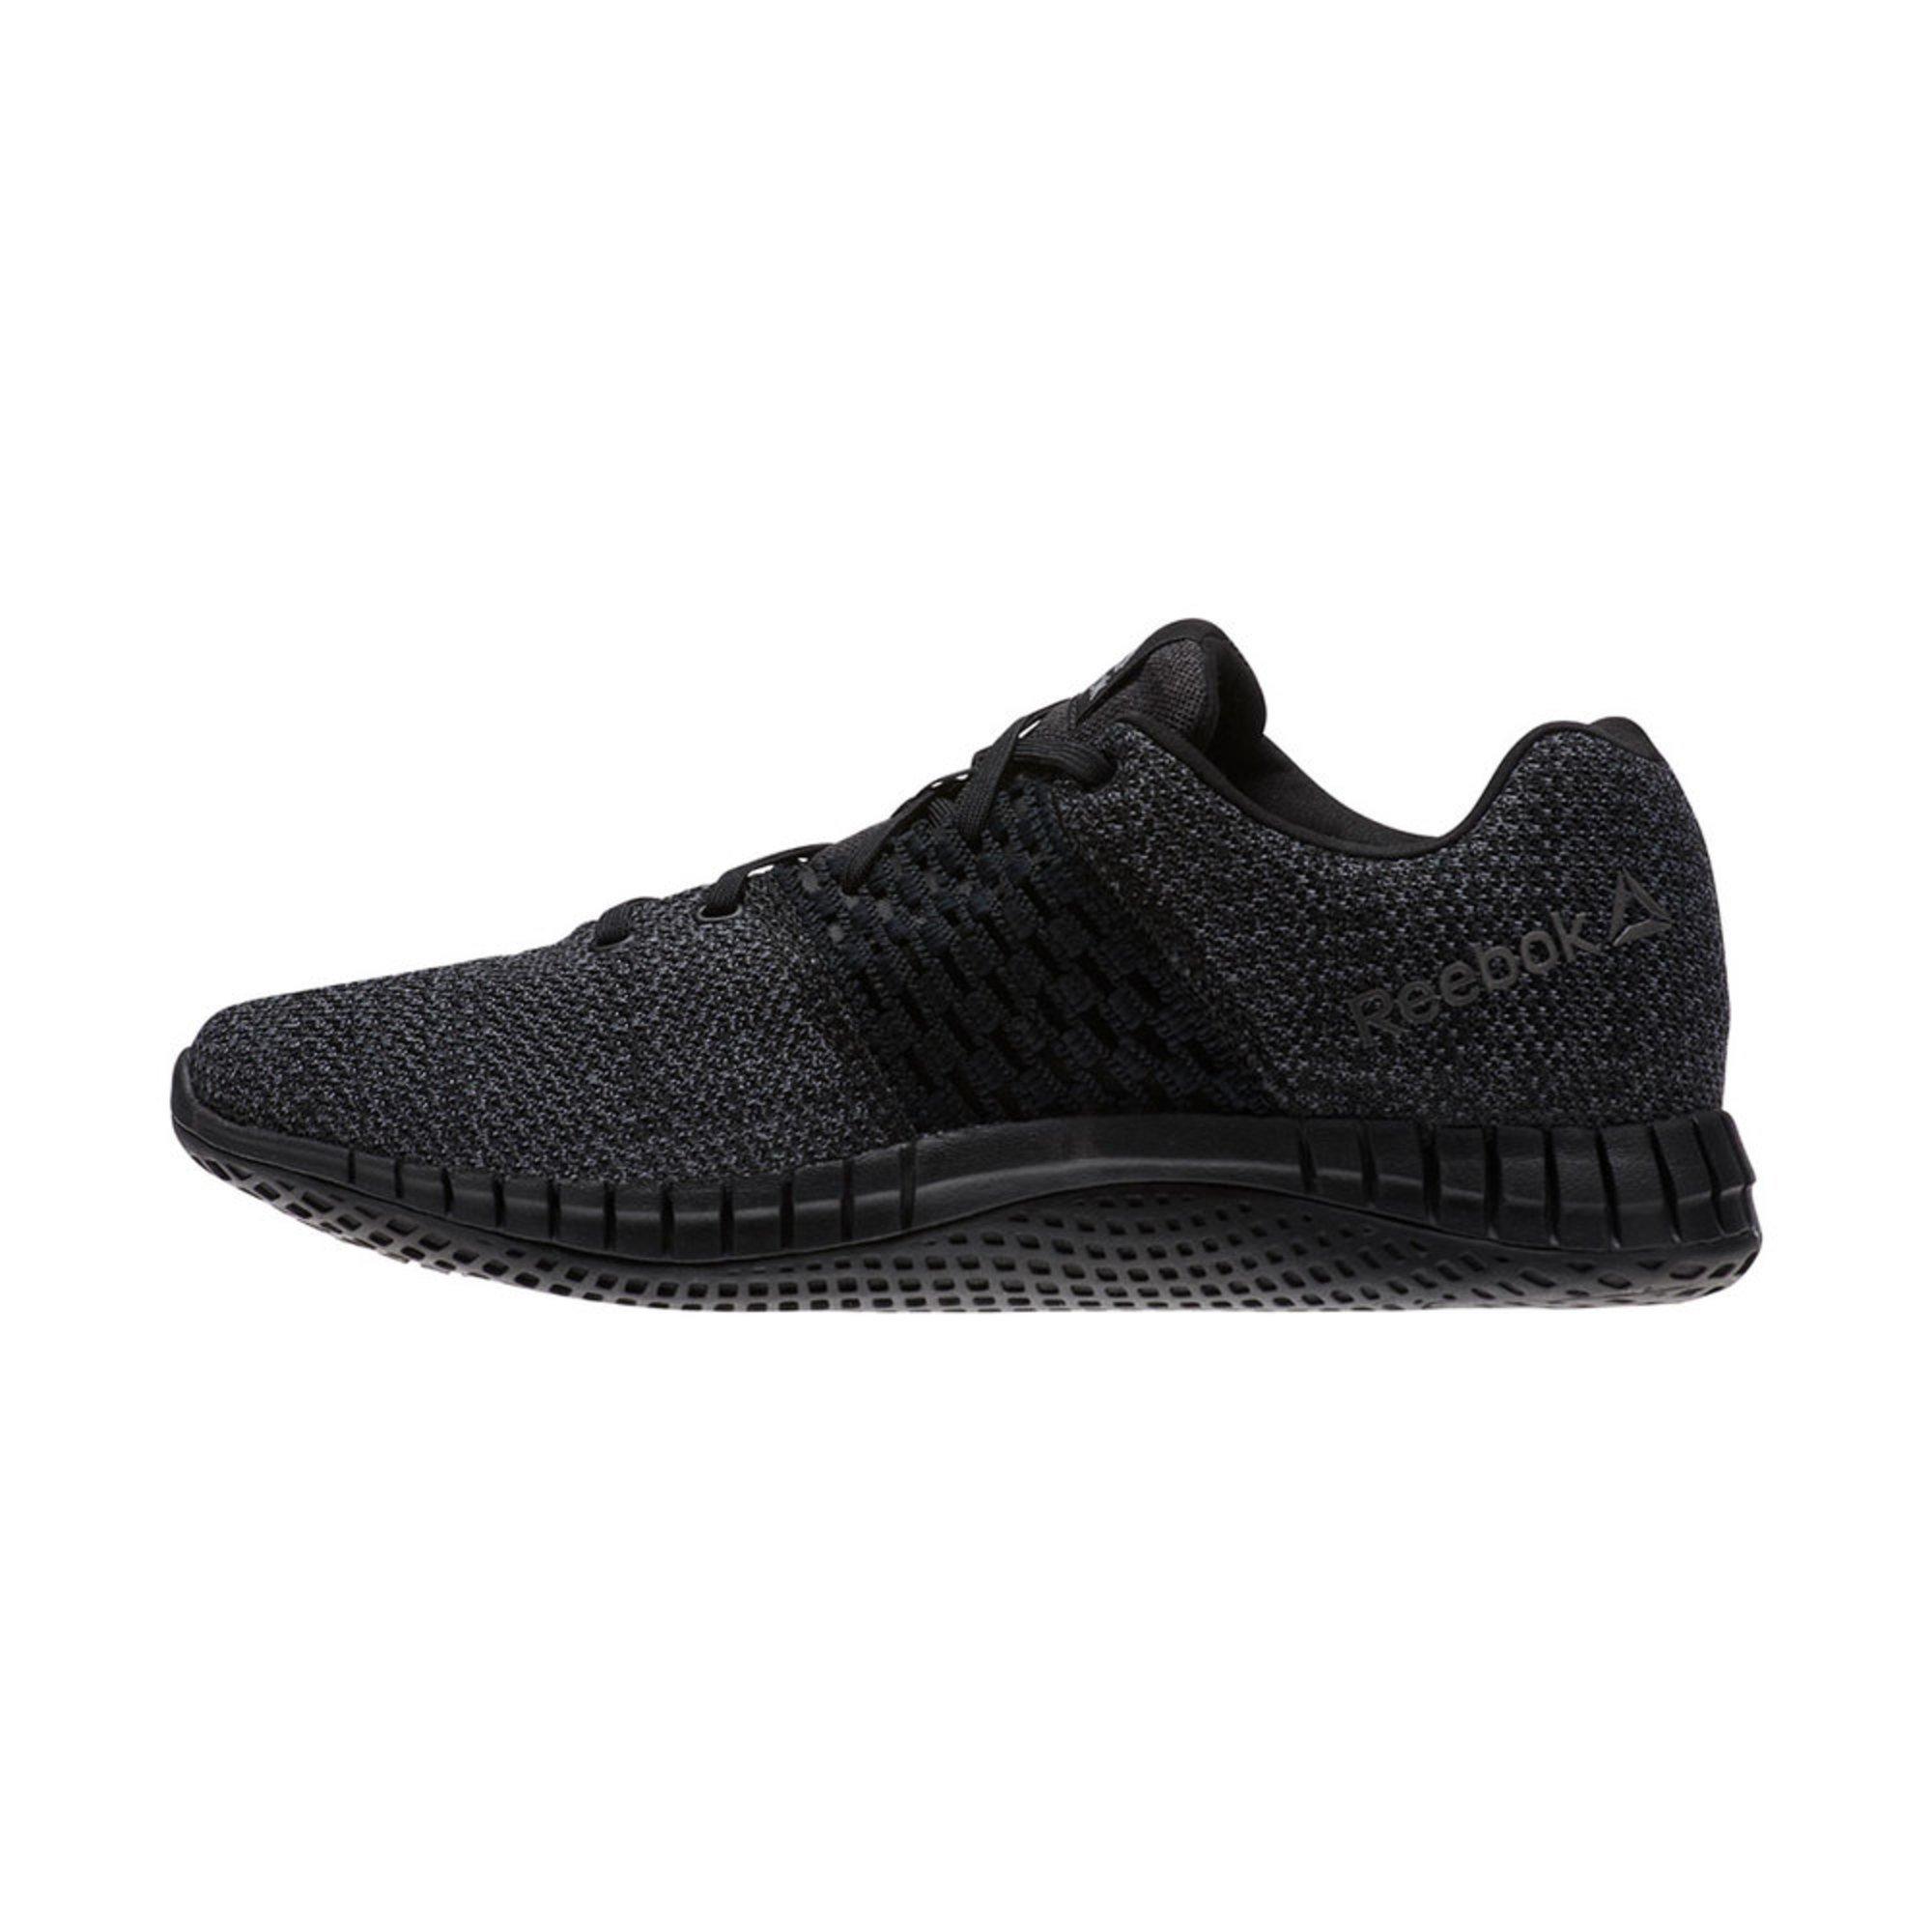 e15c9ac6075 Reebok Men's Print Run Ultk Running Shoe   Men's Running Shoes ...